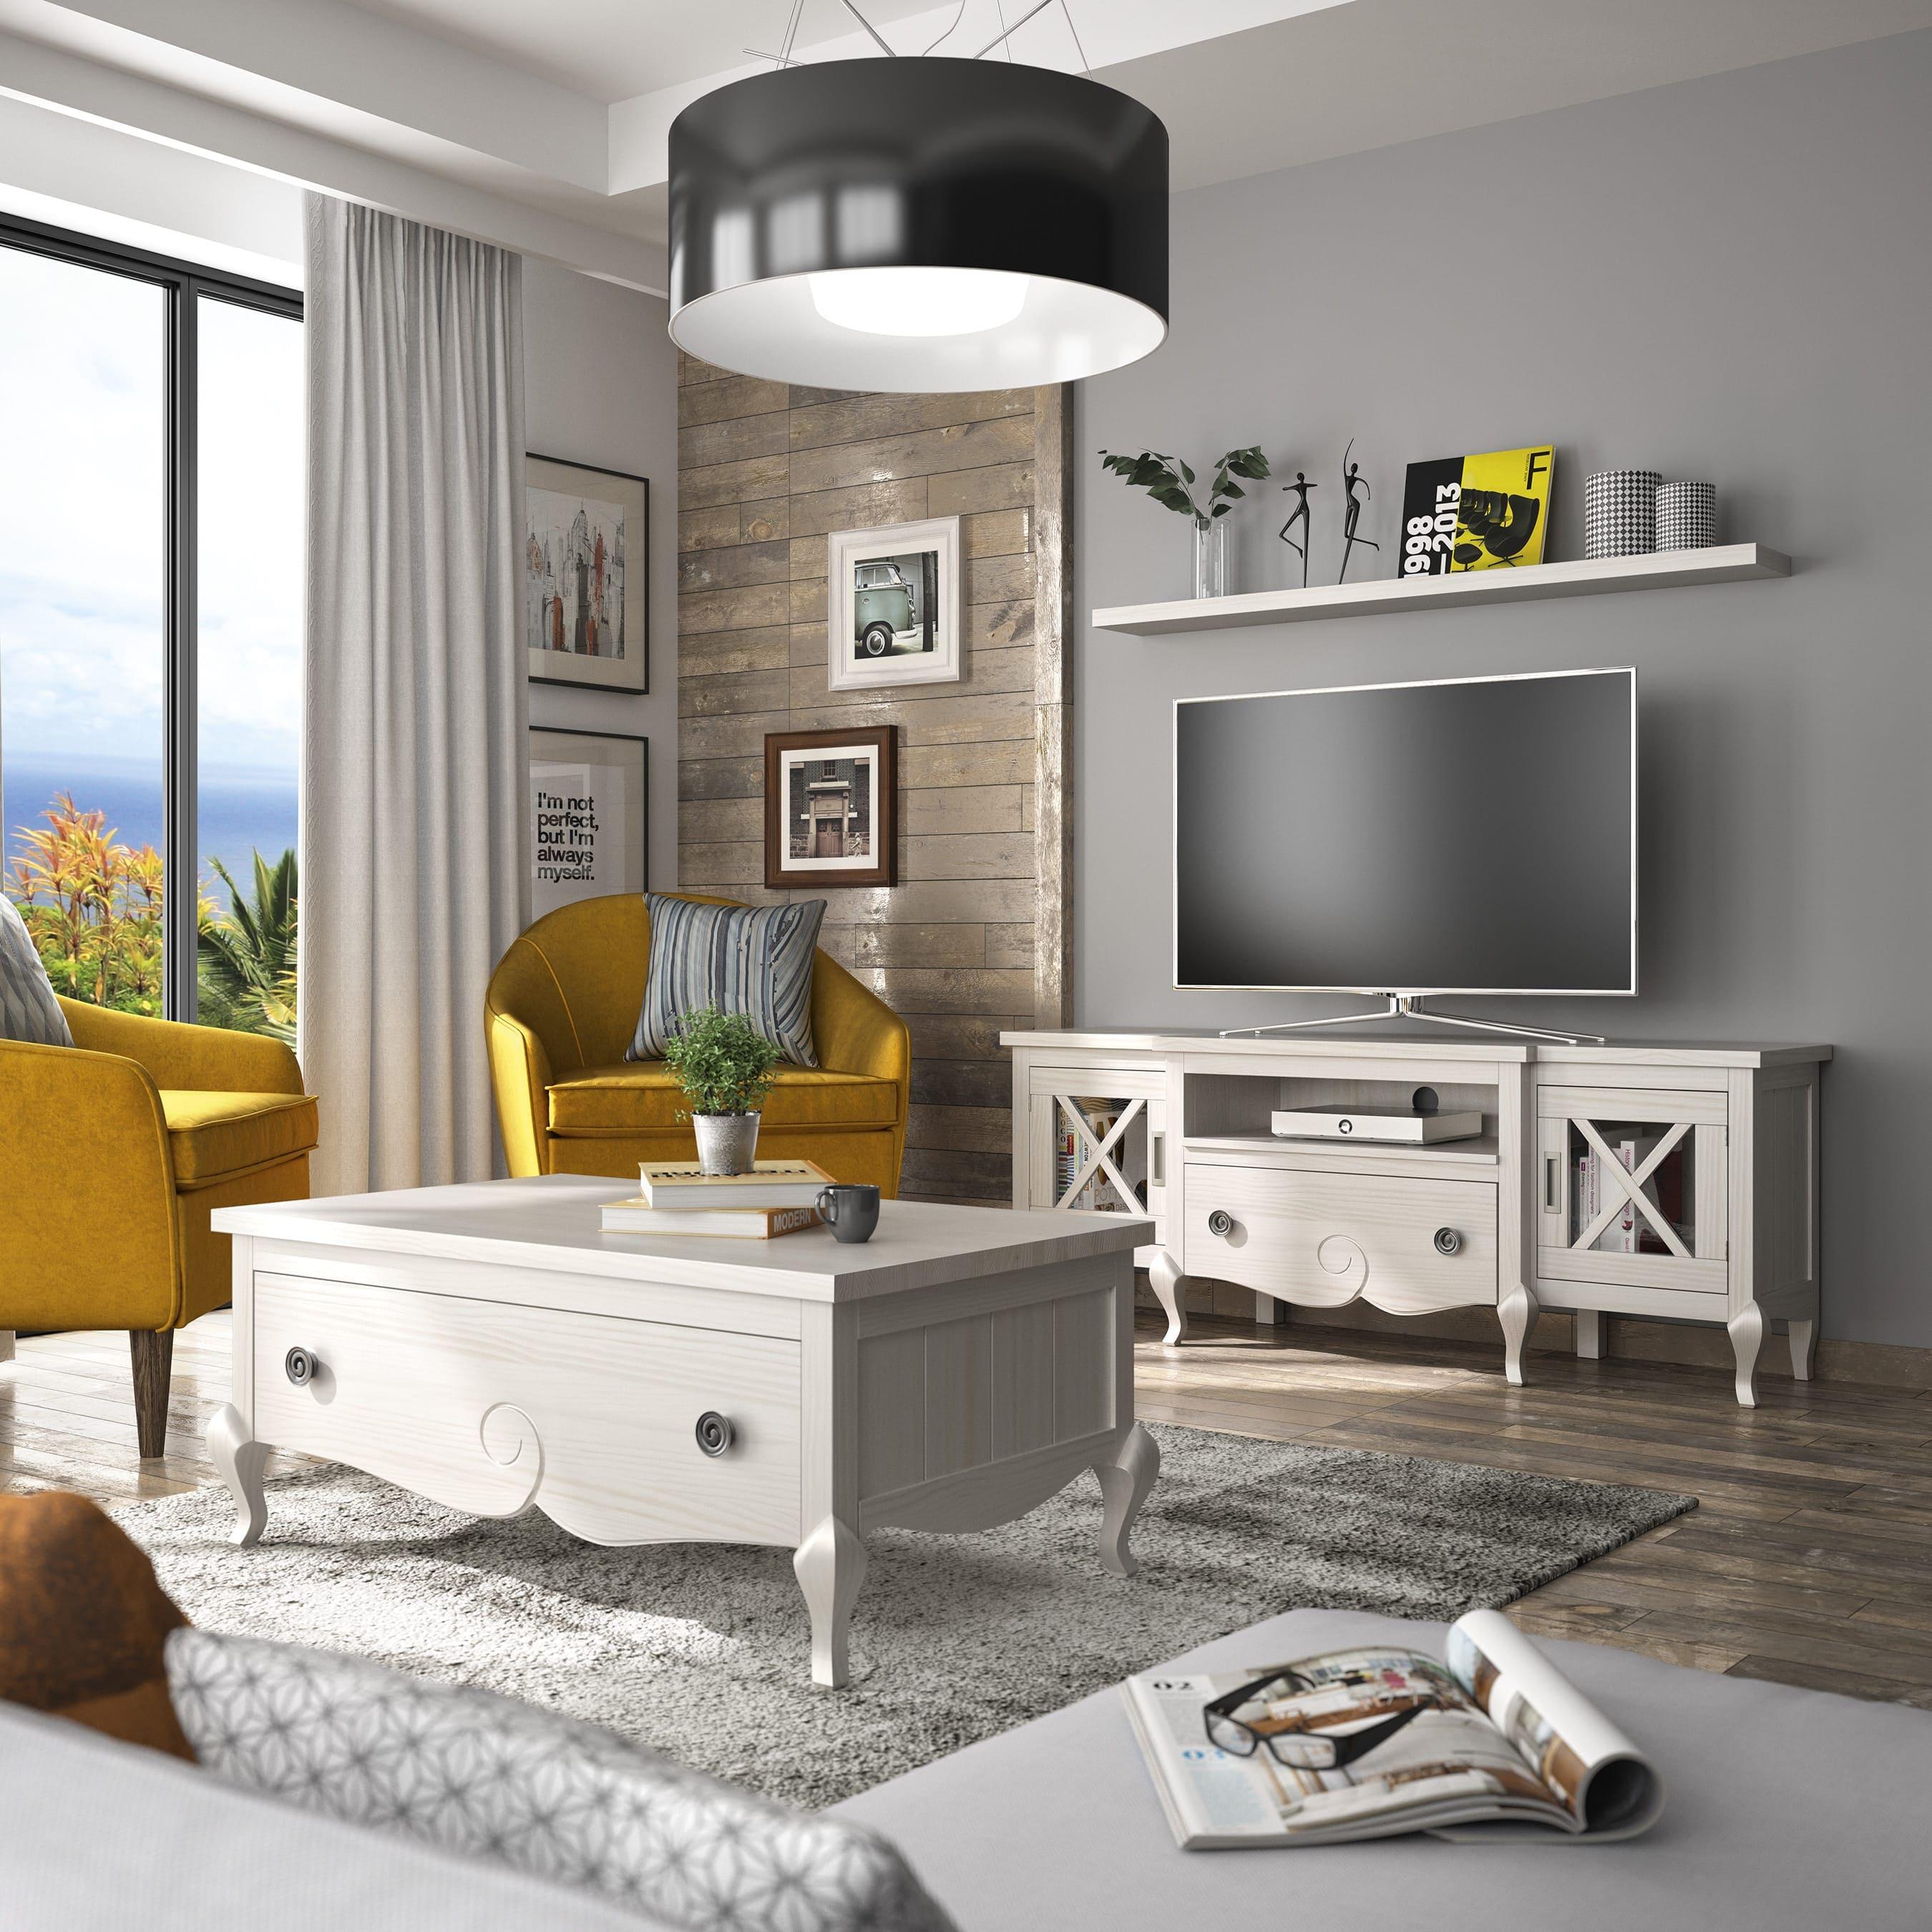 salon-contemporaneo-muebles-paco-caballero-1337-5c98b368ece1b